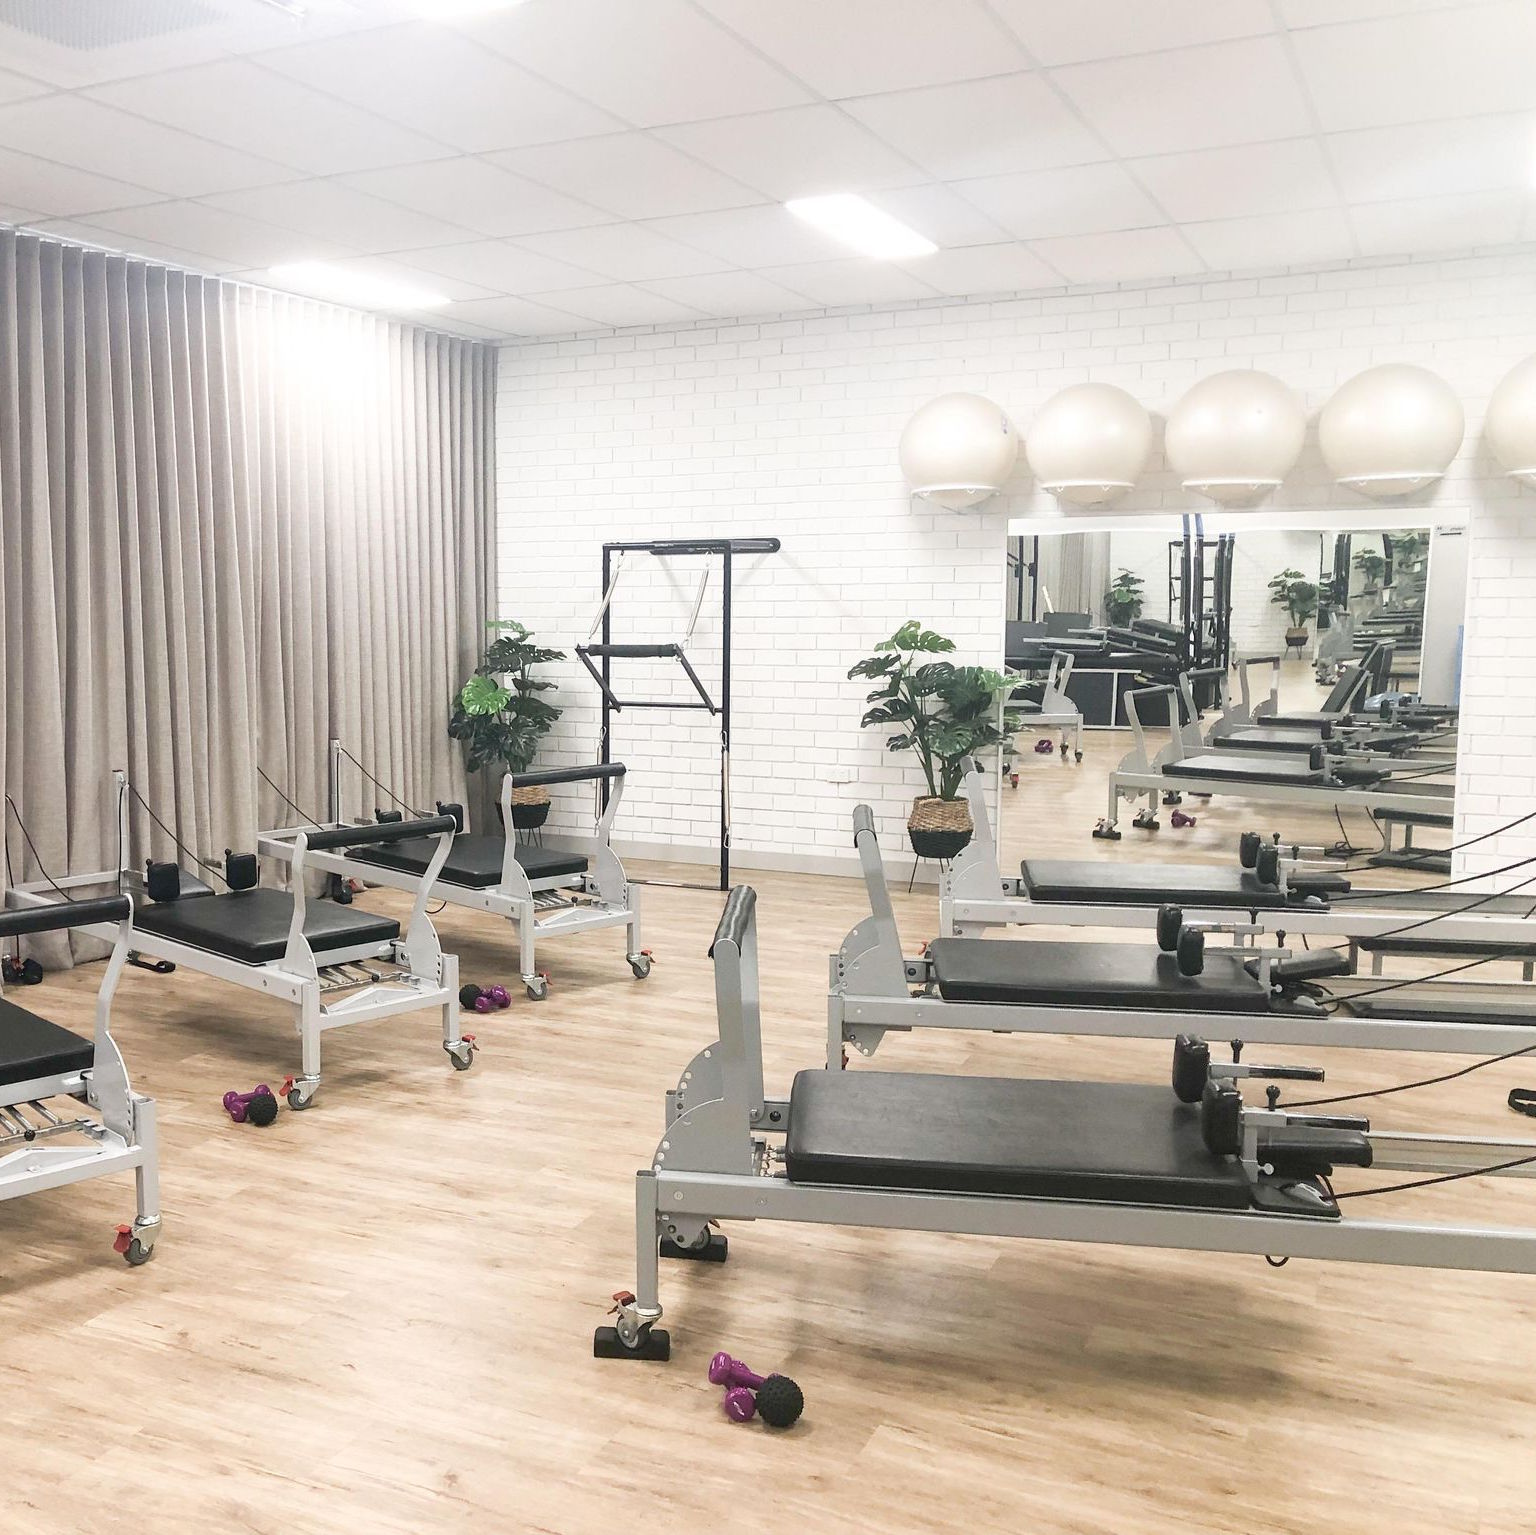 Pilates Studio - The Studio Midland